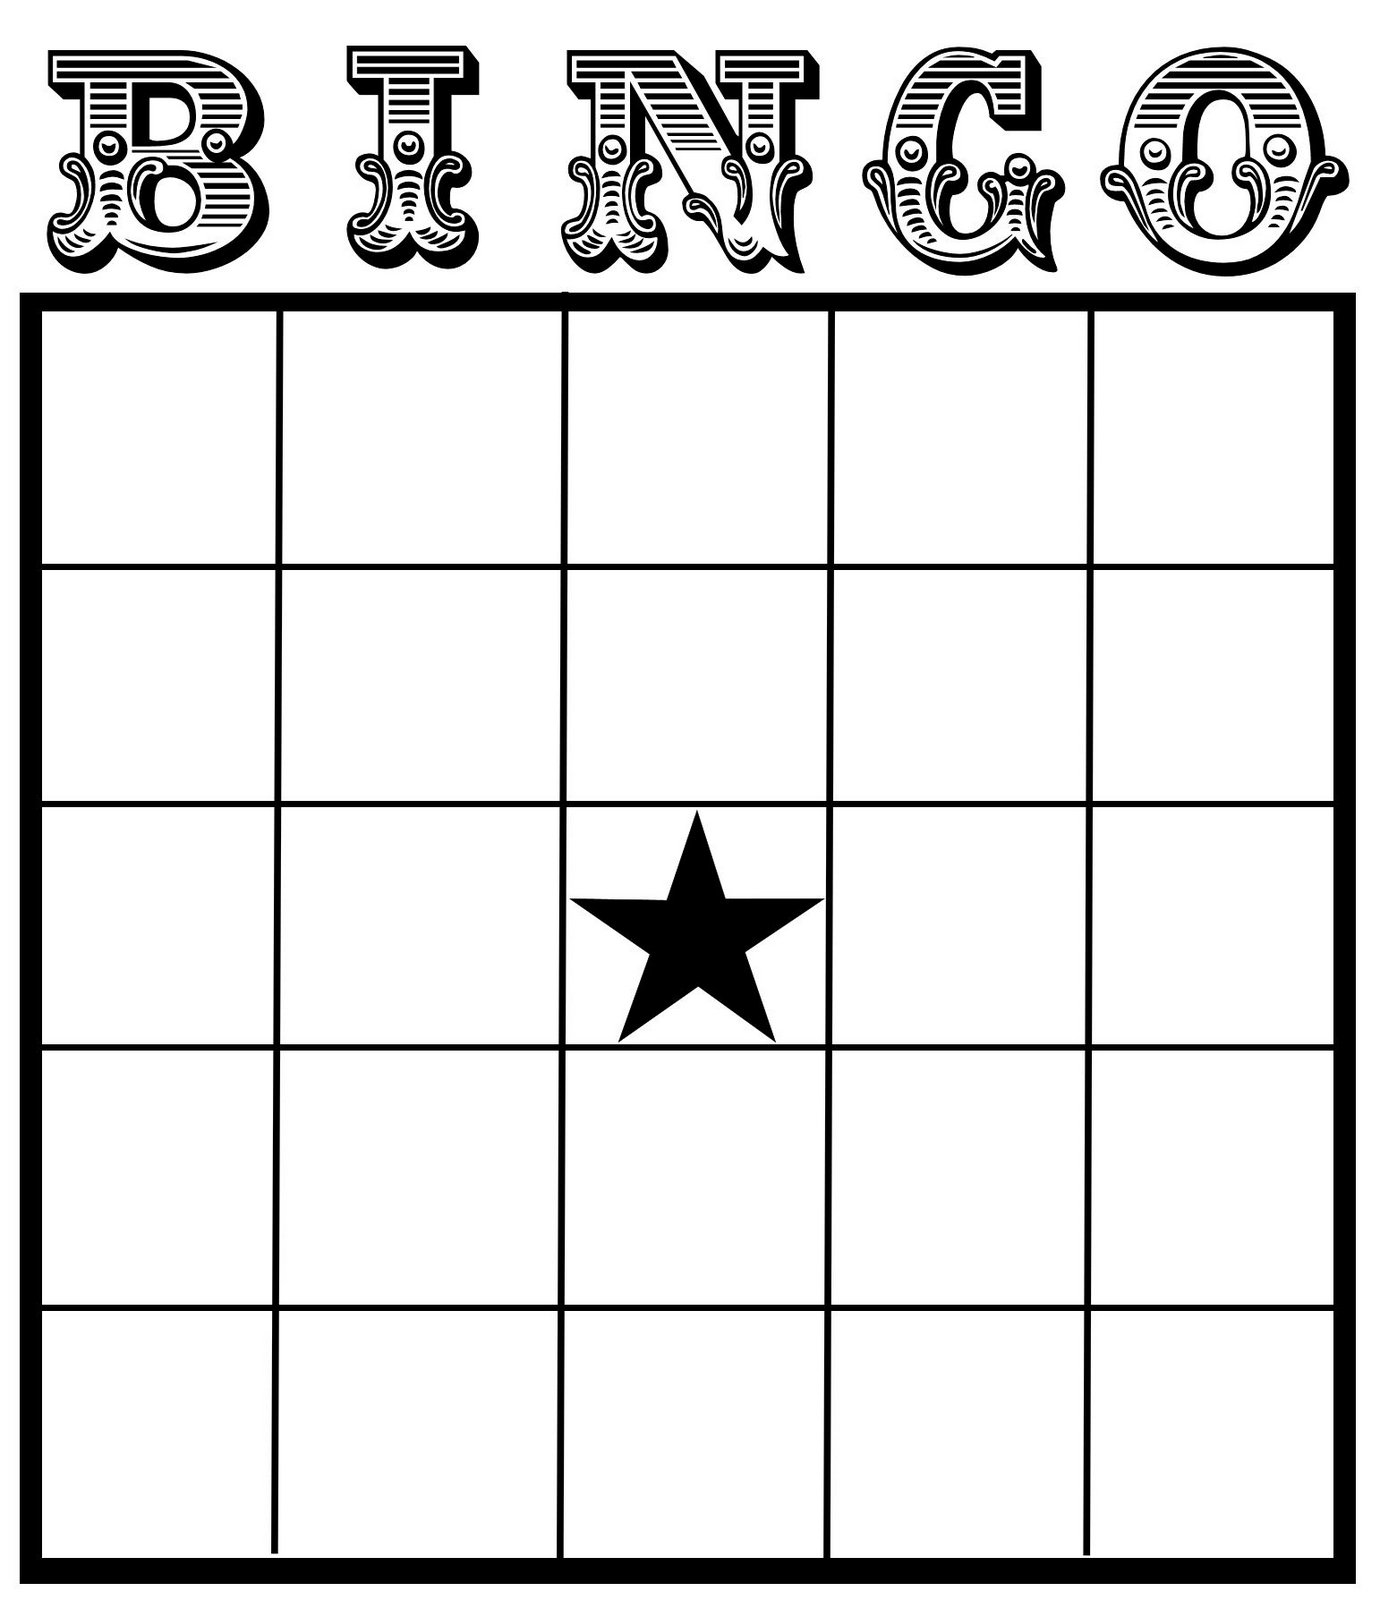 21 Best Excel Bingo Card Printable Template - printablee.com With Blank Bingo Card Template Microsoft Word